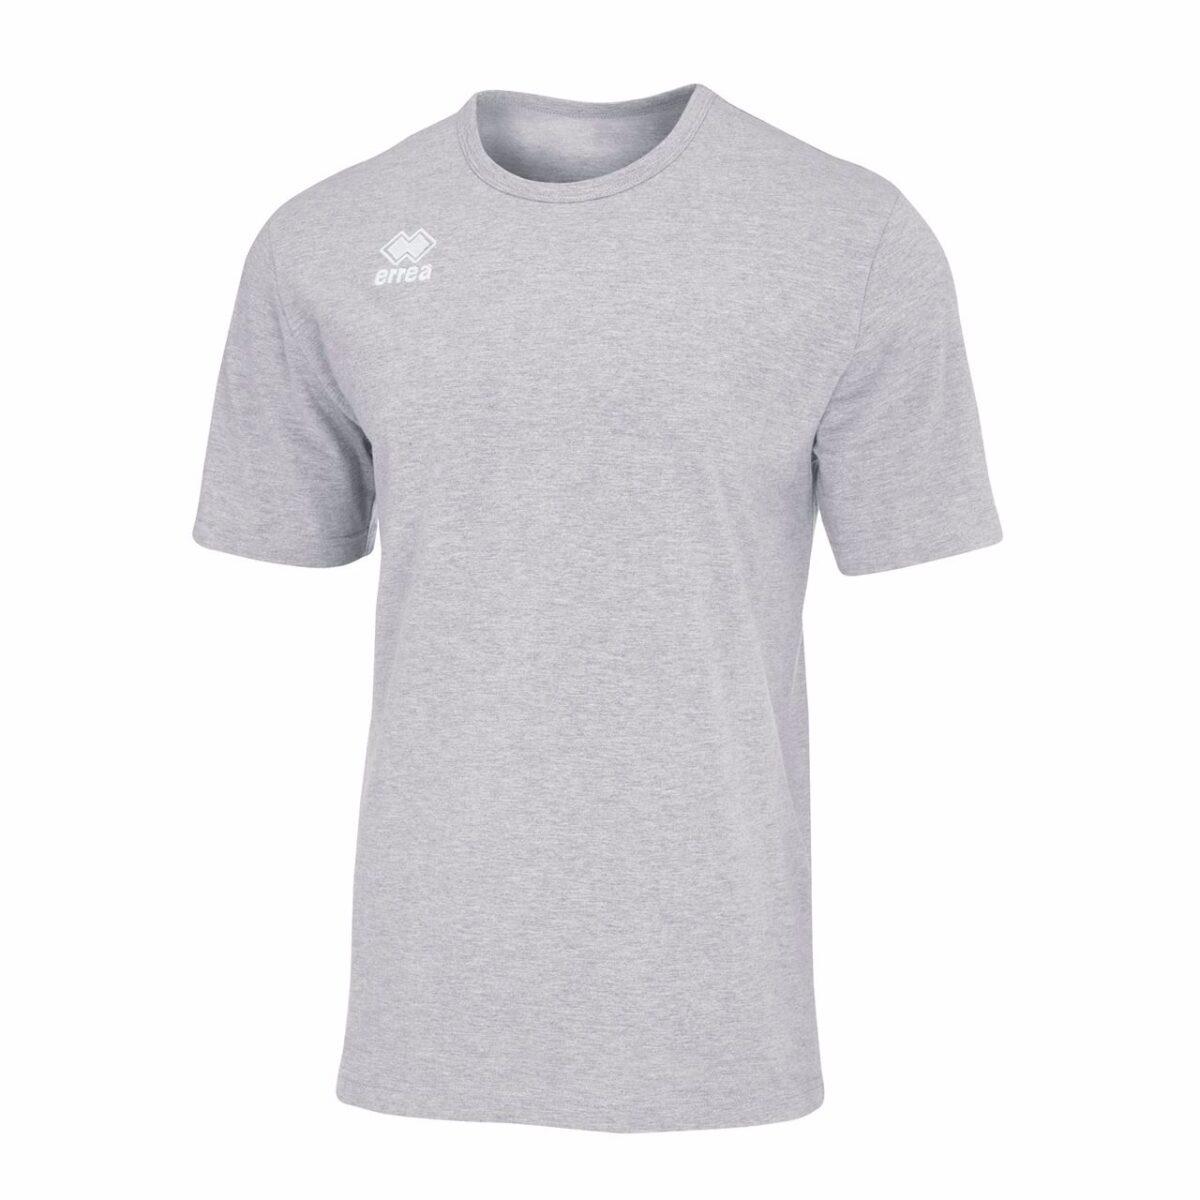 Errea COVEN Shirt EM000C